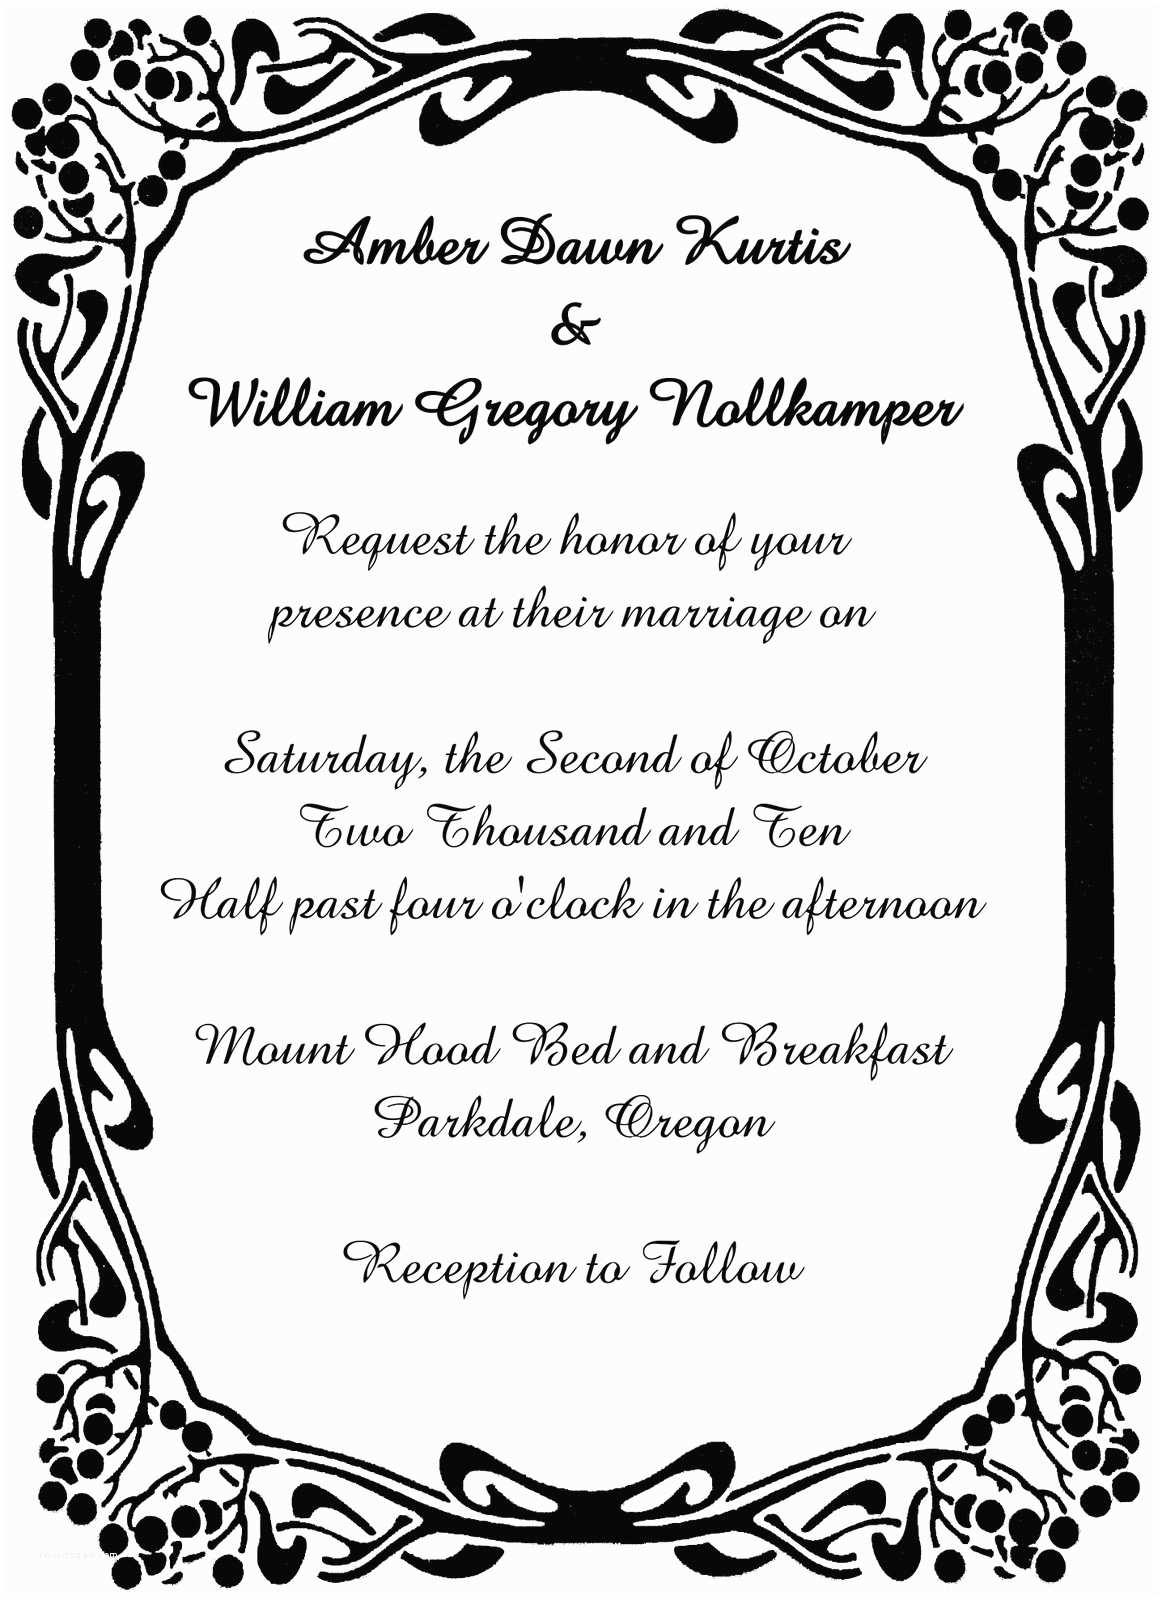 Wedding Invitation Borders 15 Border Designs for Wedding Invitations Wedding